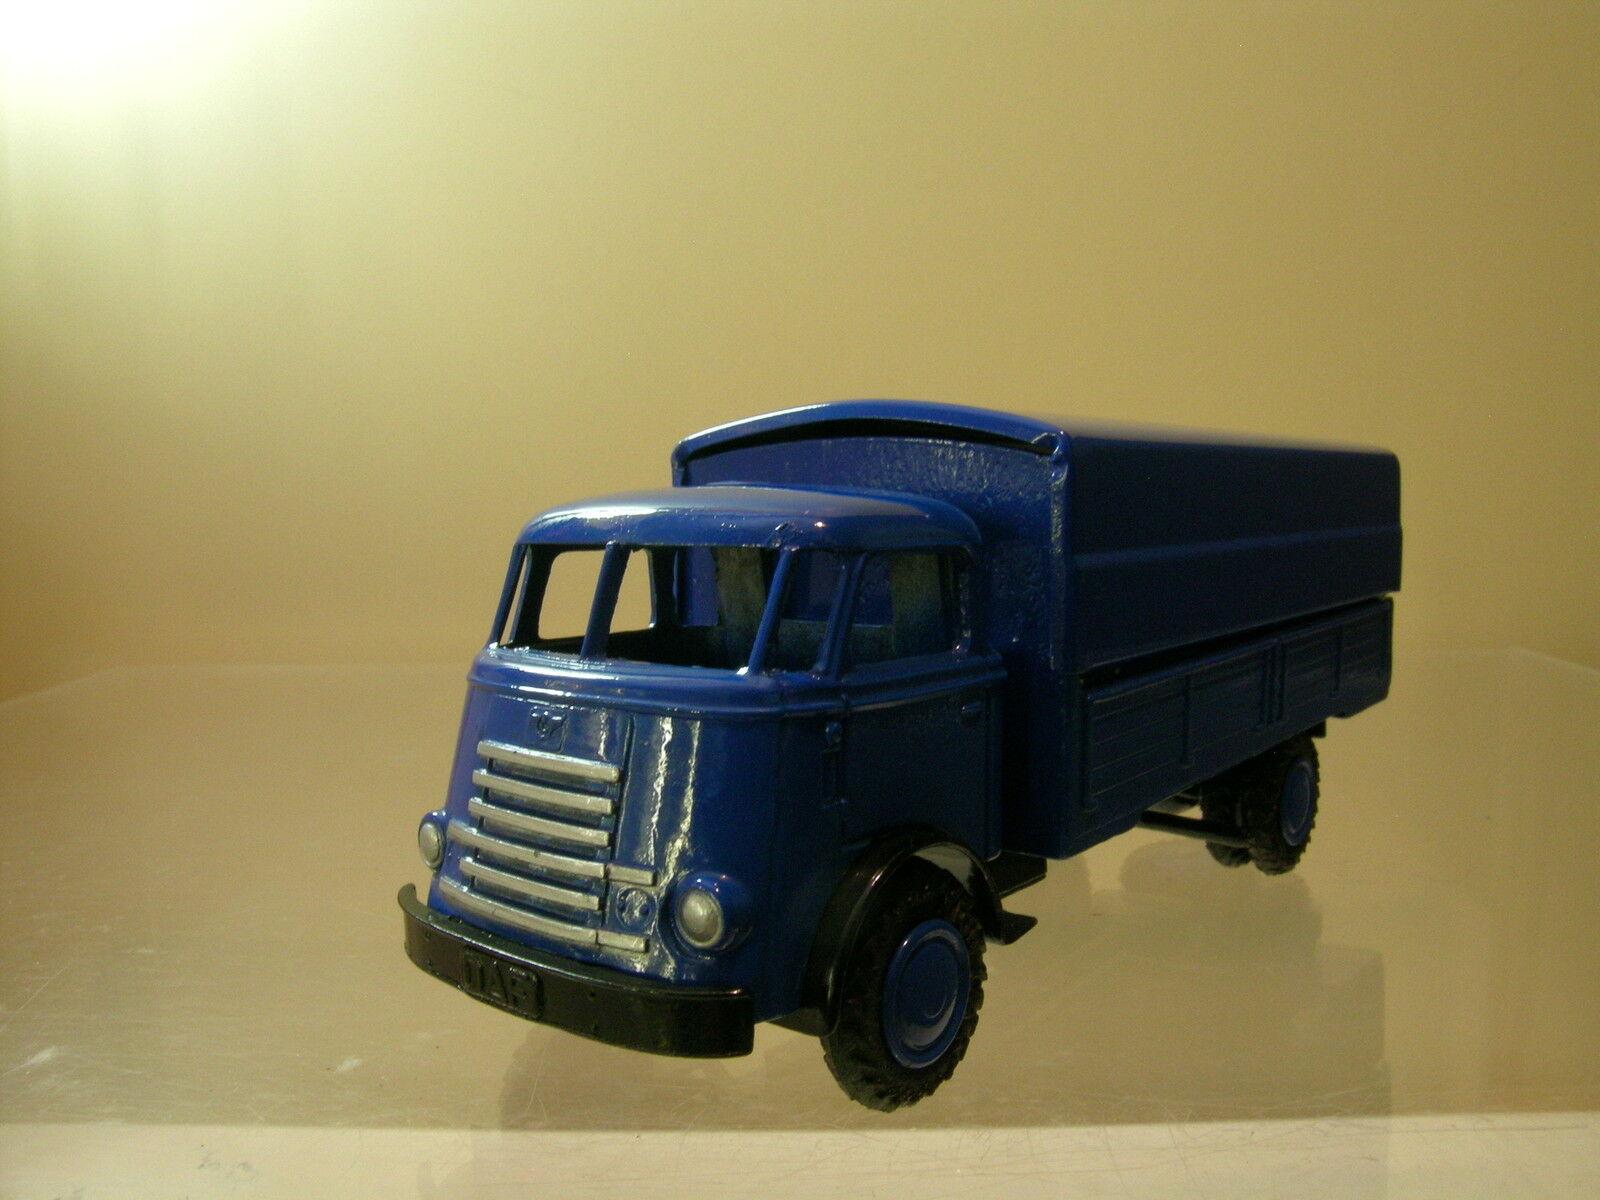 LION CAR No.23 DAF1100 6 STREPER FRONTSTUUR TRUCK COLOUR blu SCALE 1 50